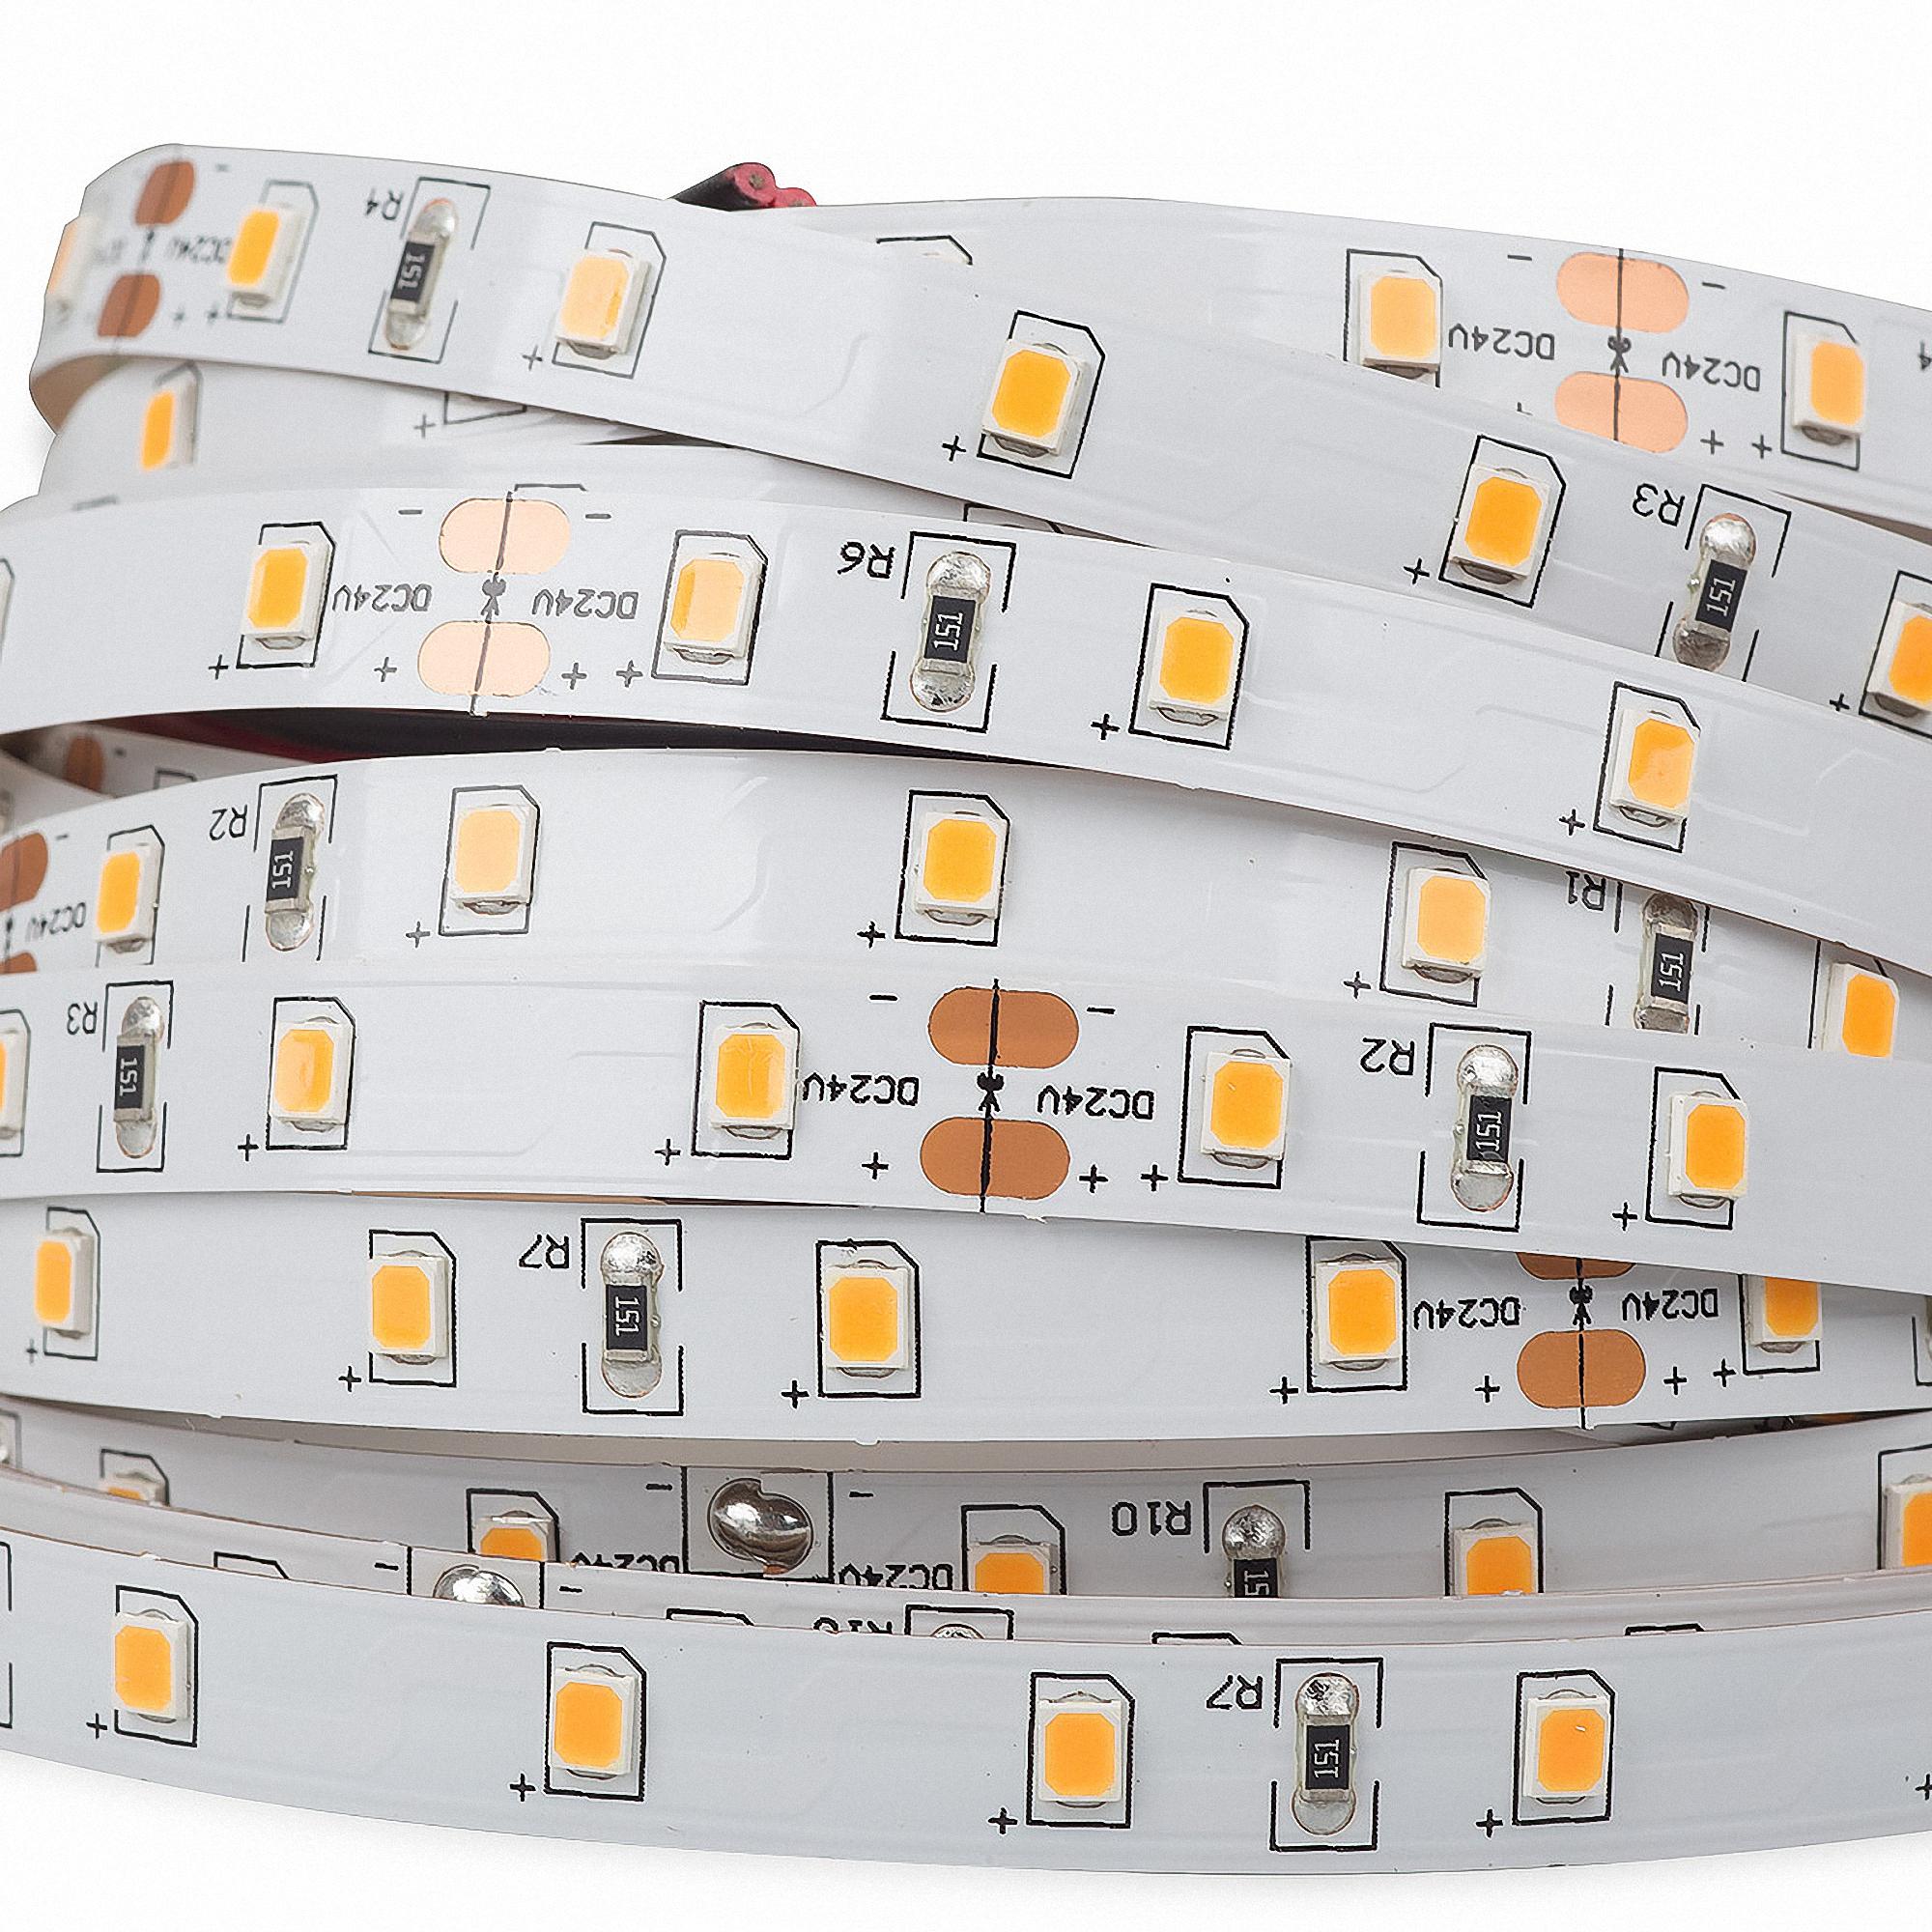 Smd2216 Cri90 5m 96w 280led//M 4000k 24v Led Strip Streifen Weiß Neutro C3f2